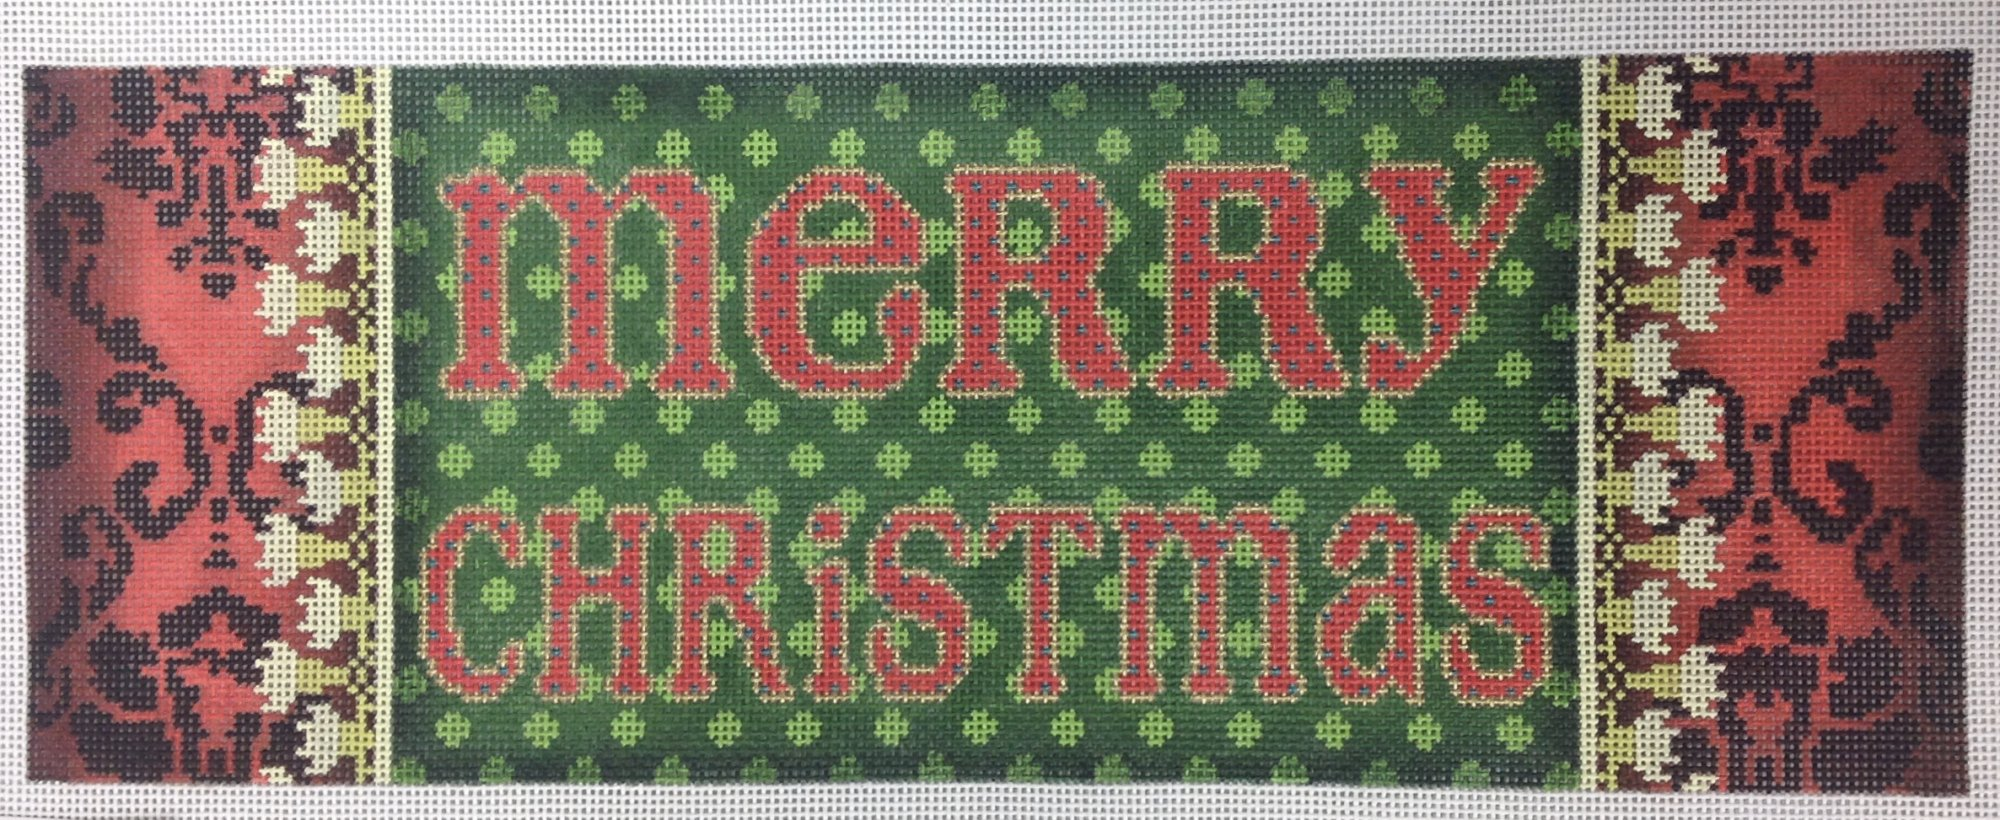 merry christmas***